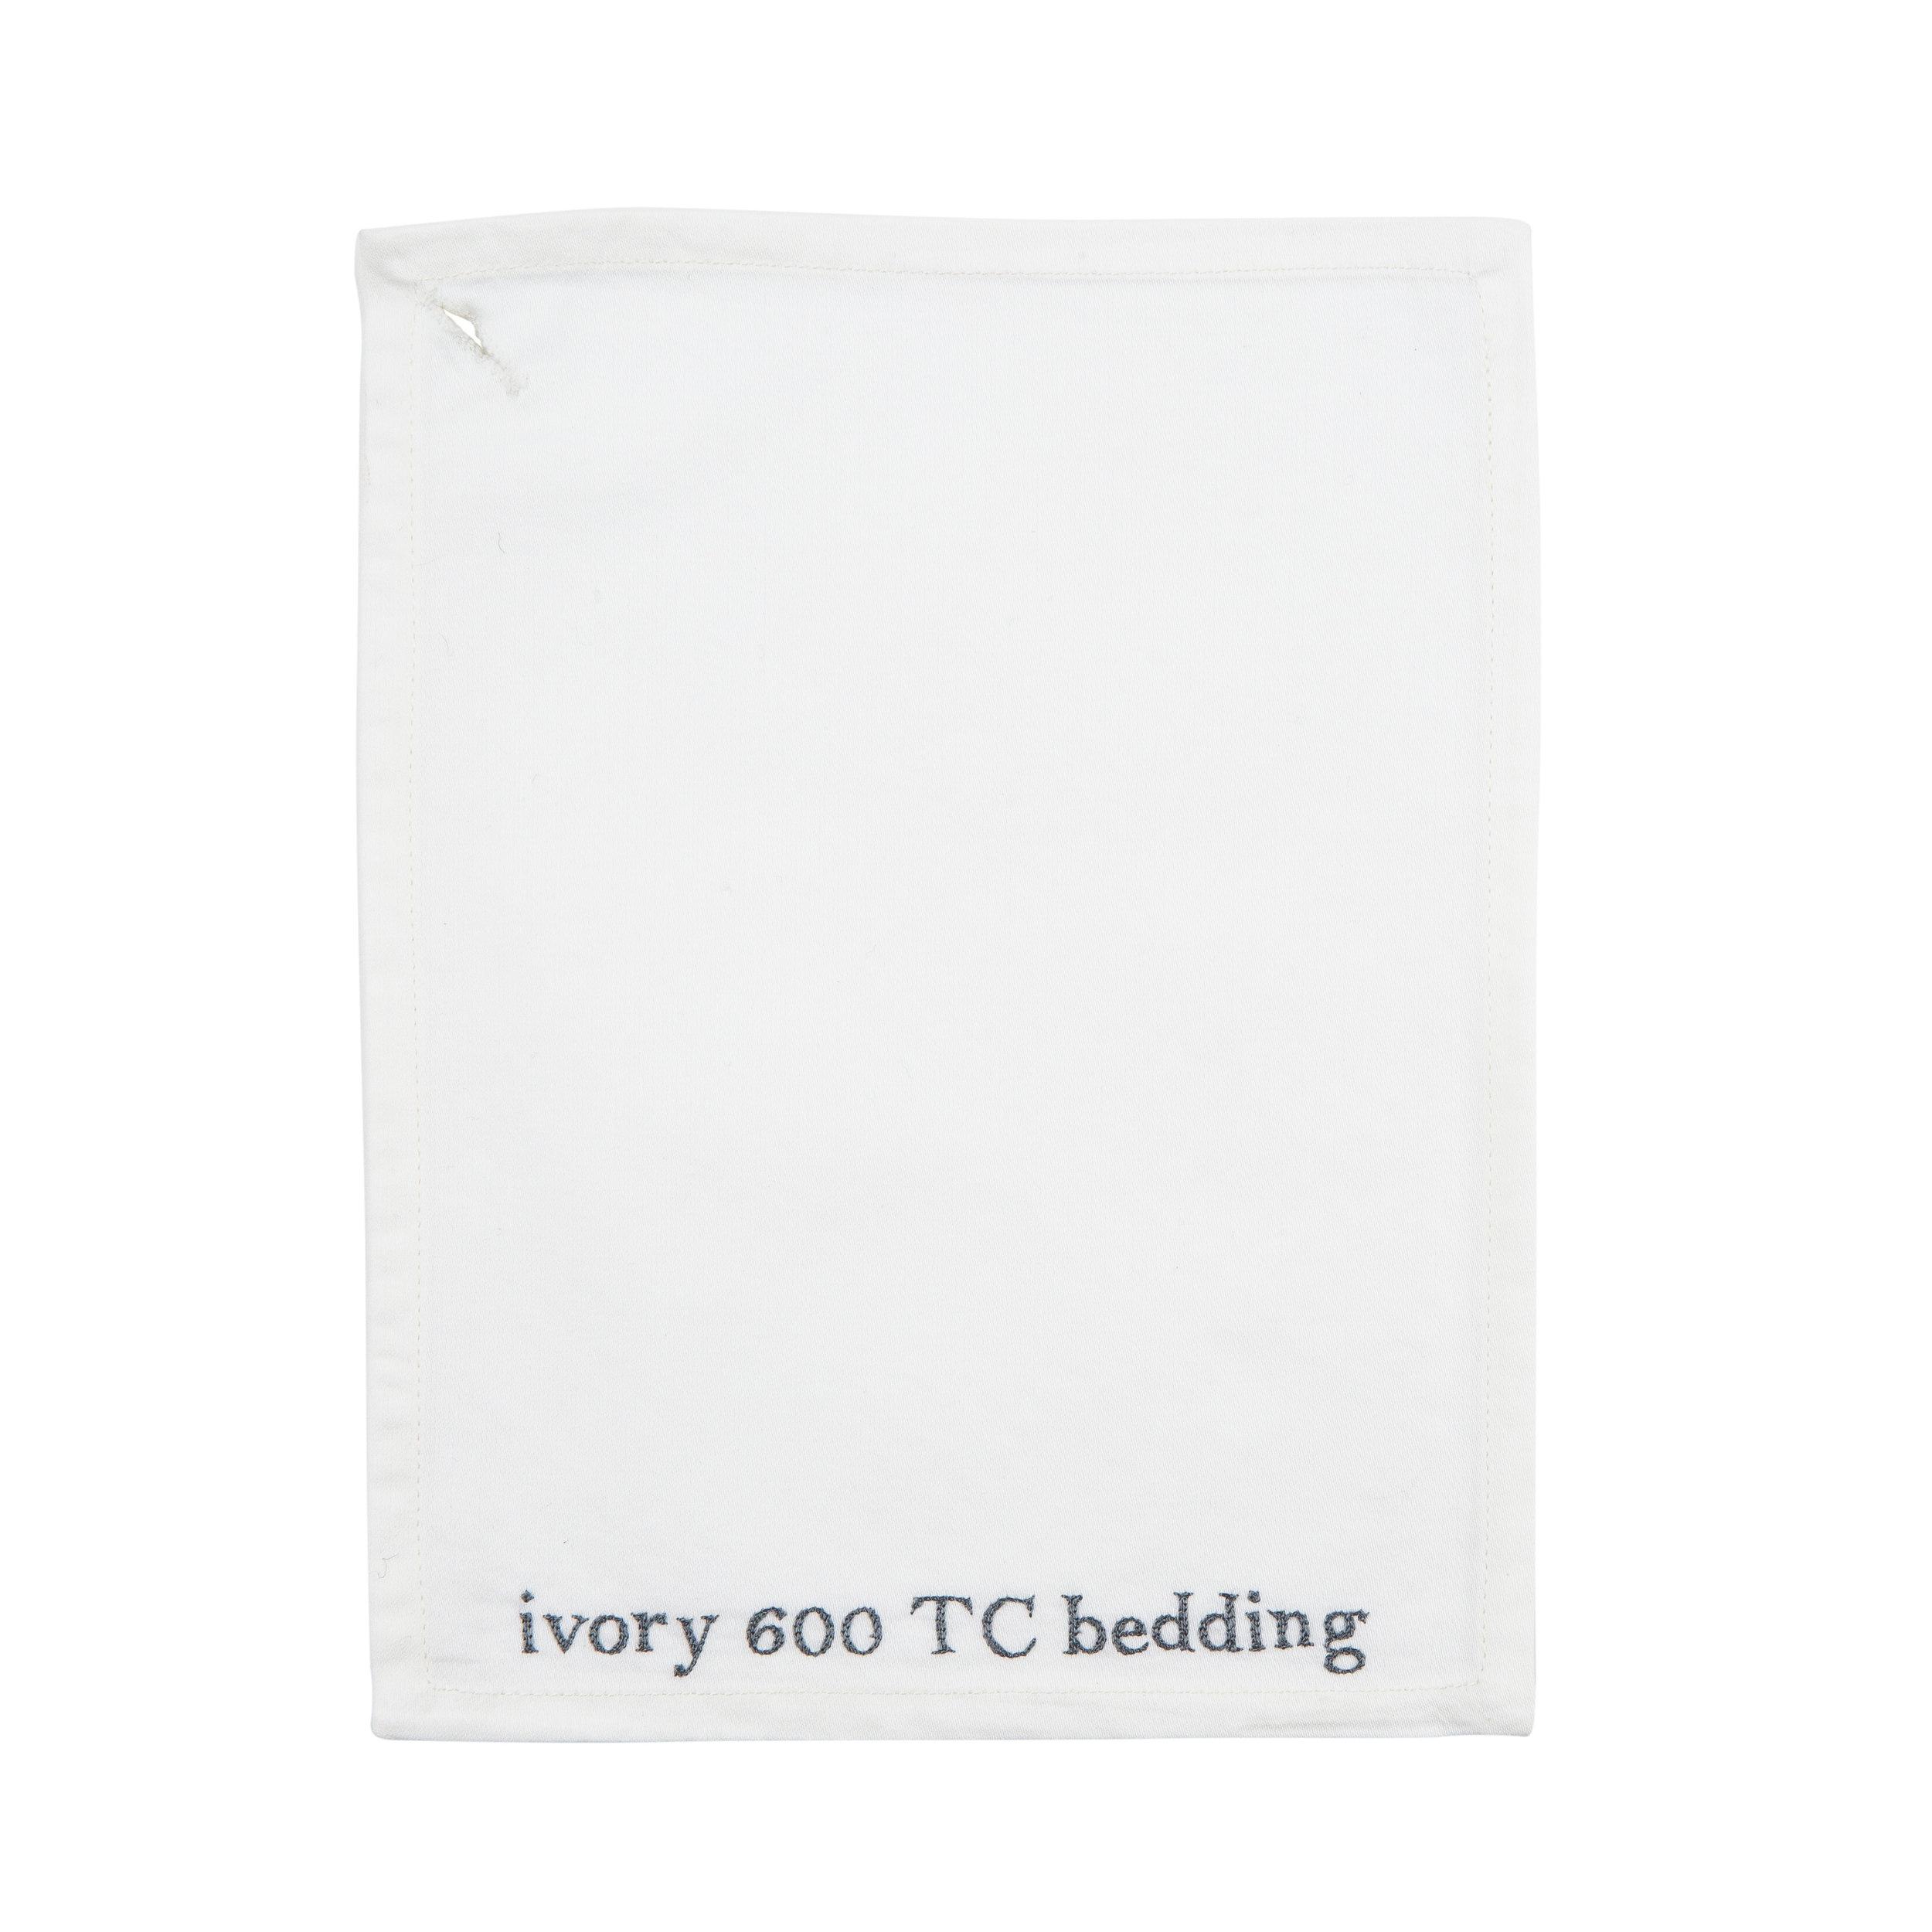 IVORY 600 TC BEDDING